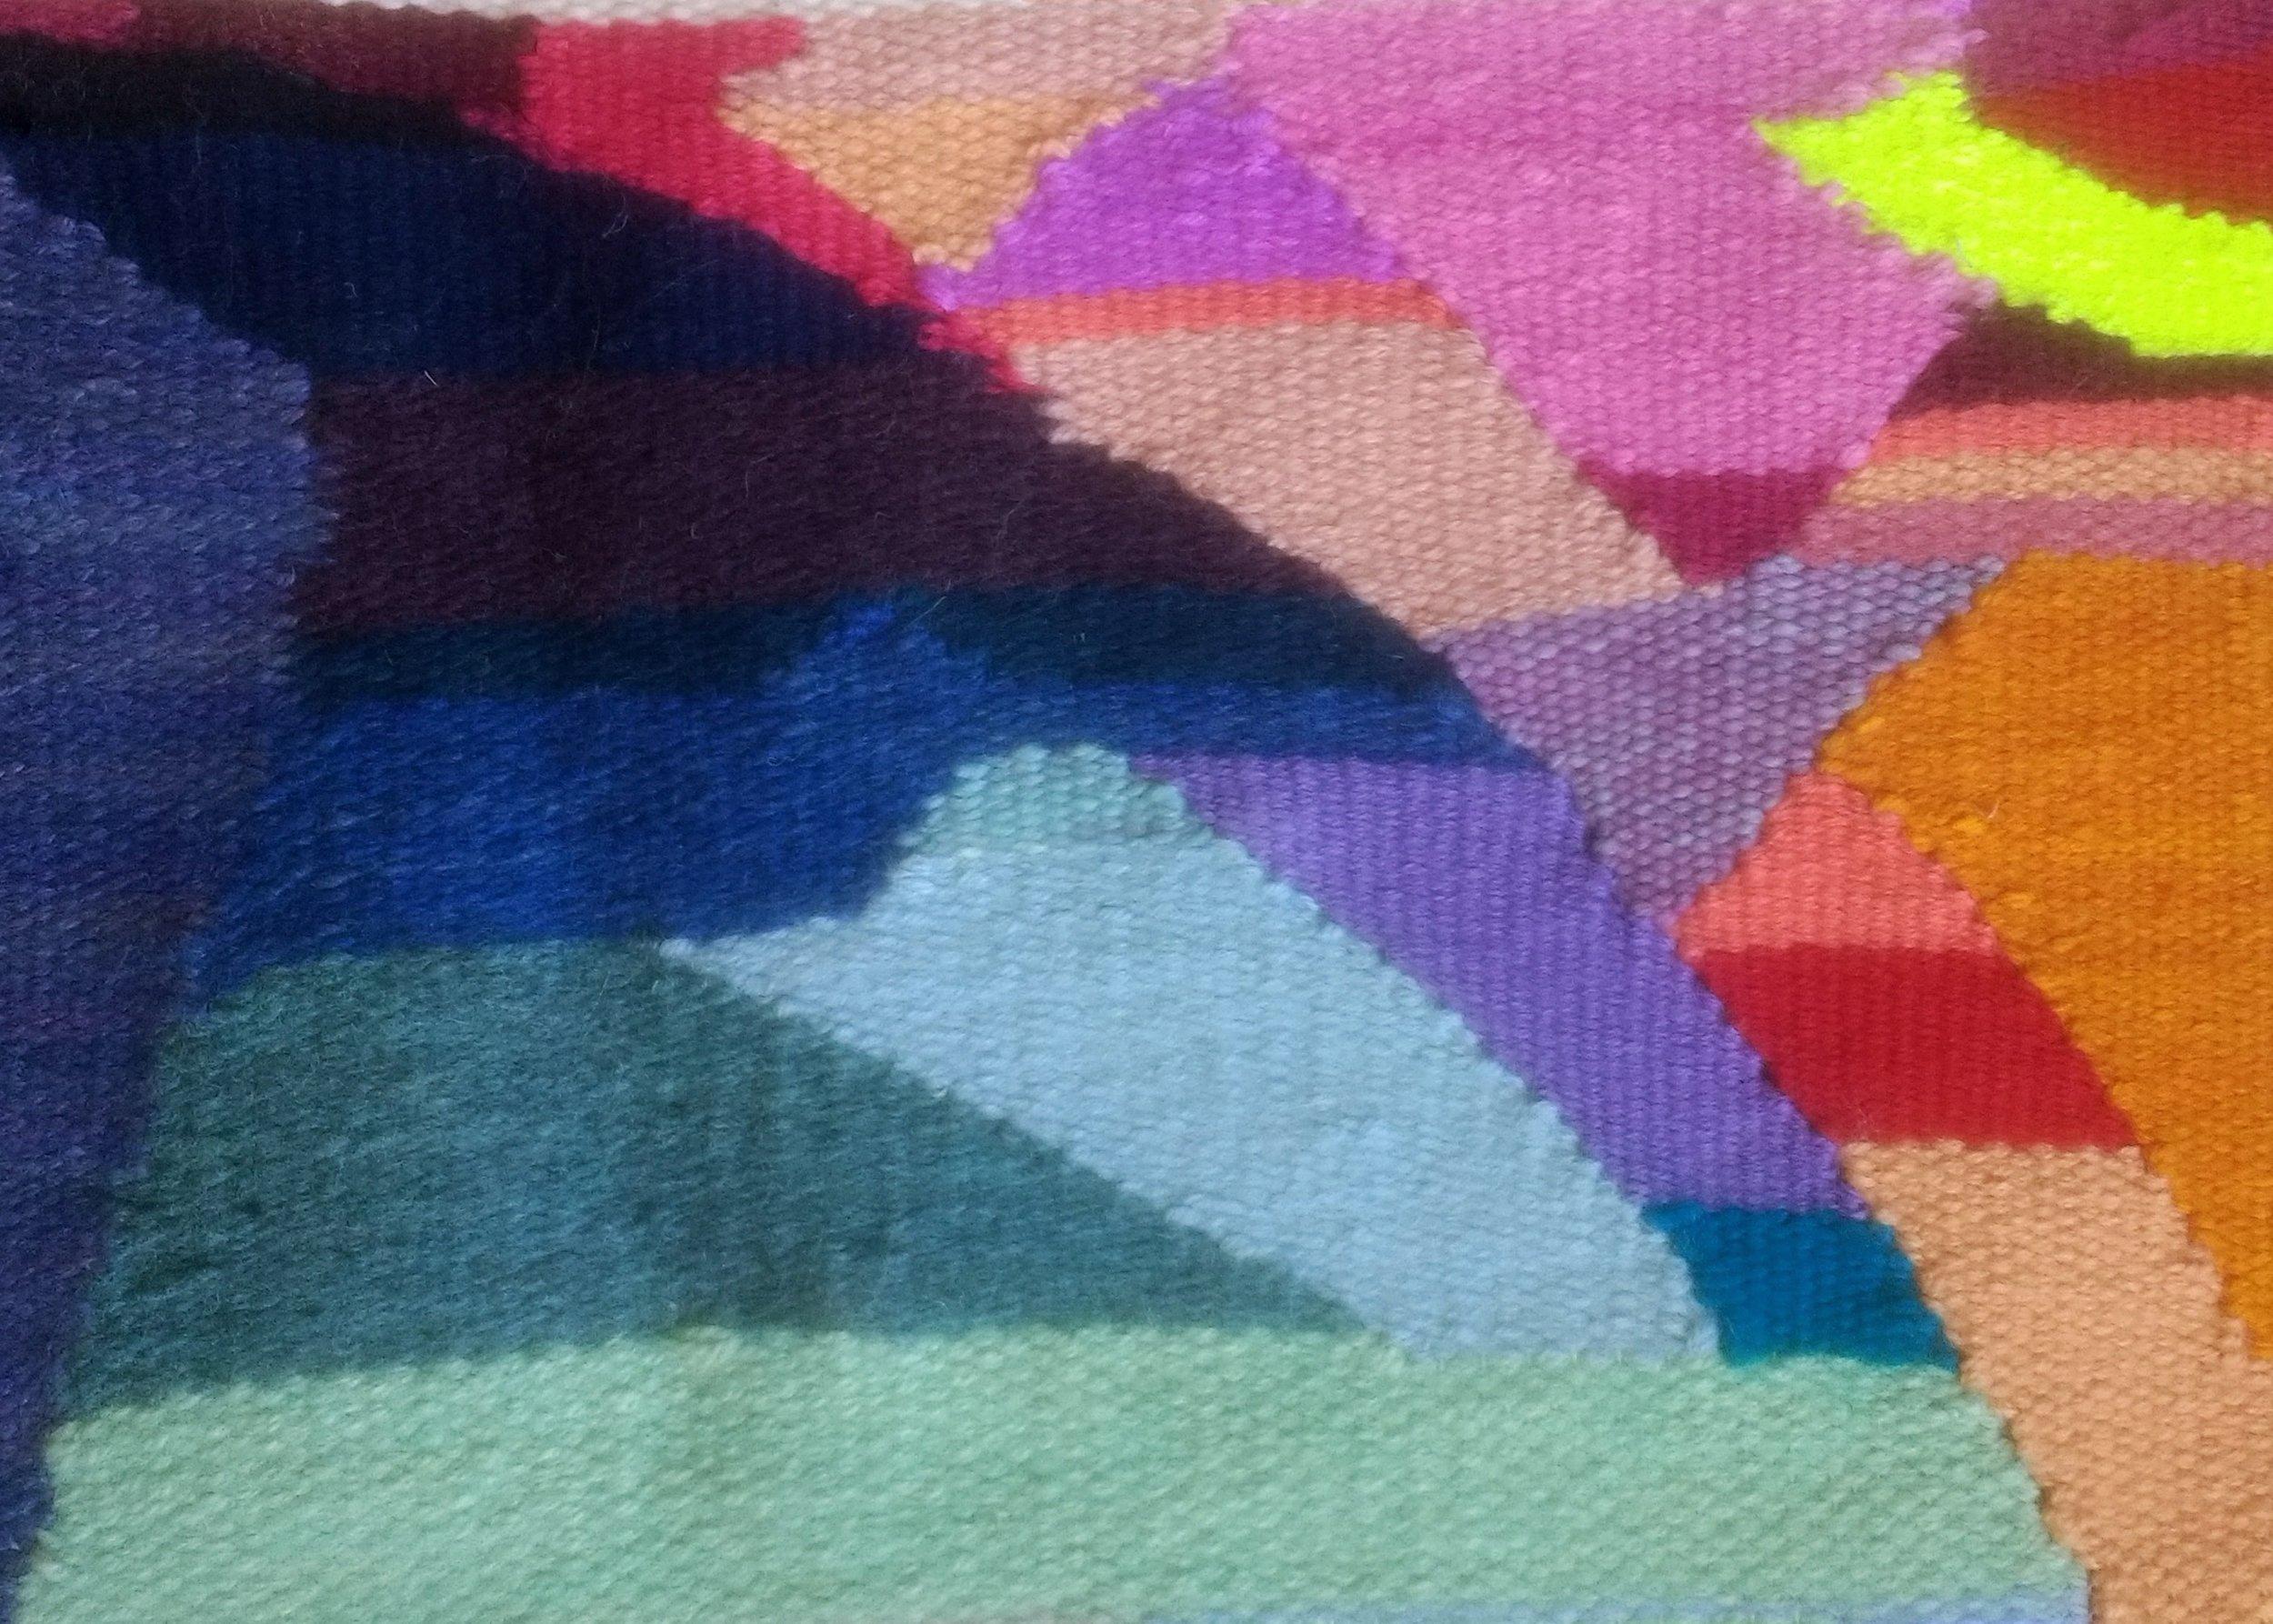 Tapestry Workshop - January 2018 @ Trohv